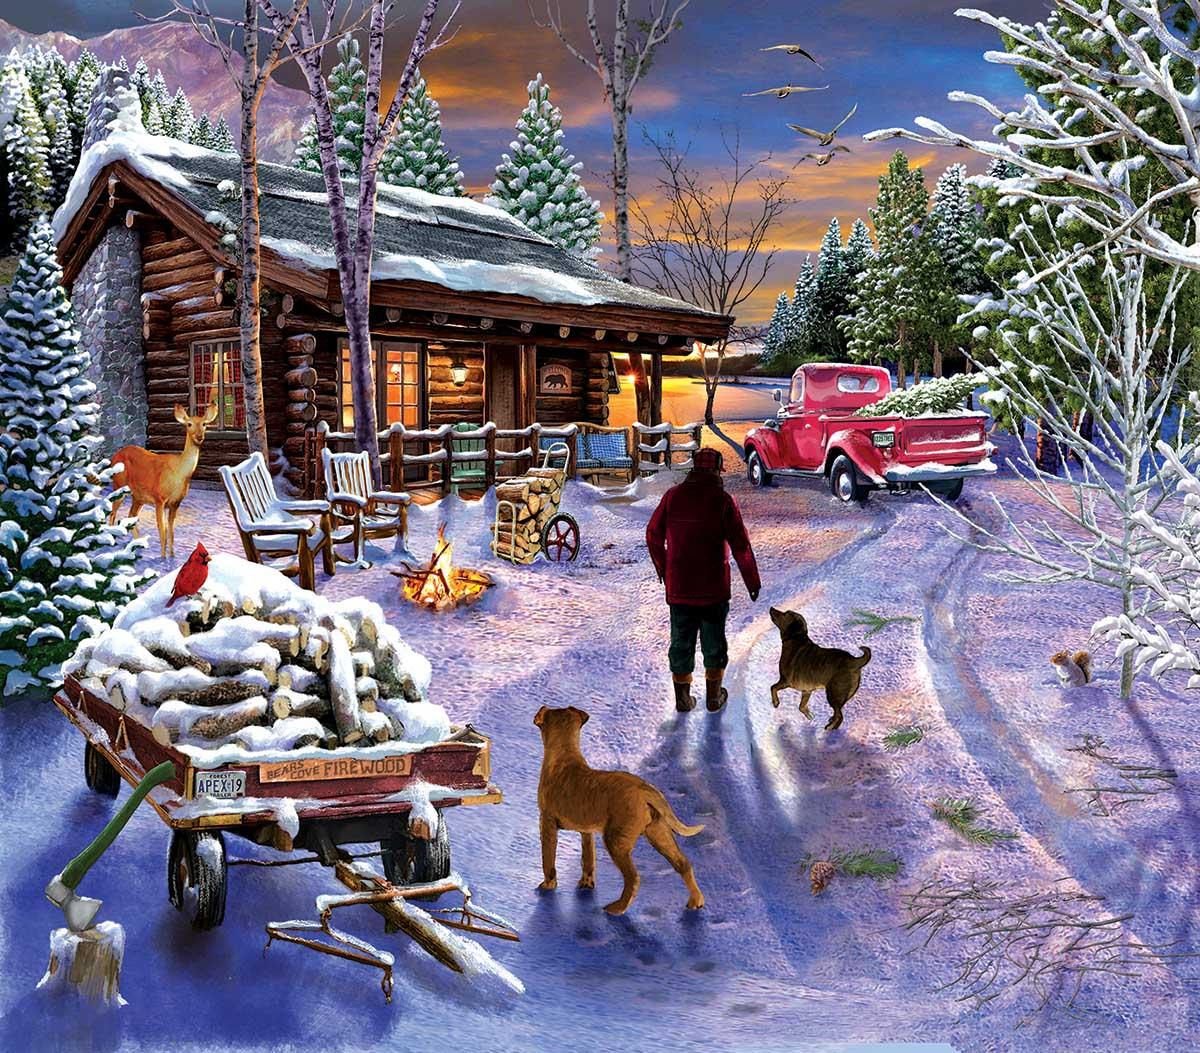 Winter Refuge Winter Jigsaw Puzzle